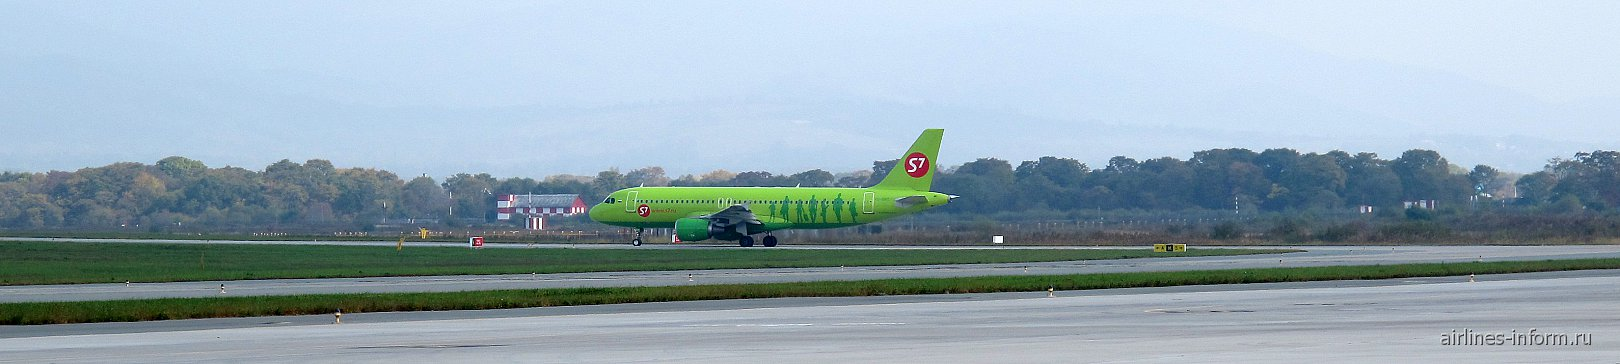 Airbus A320 S7 Airlines в аэропорту Владивостока